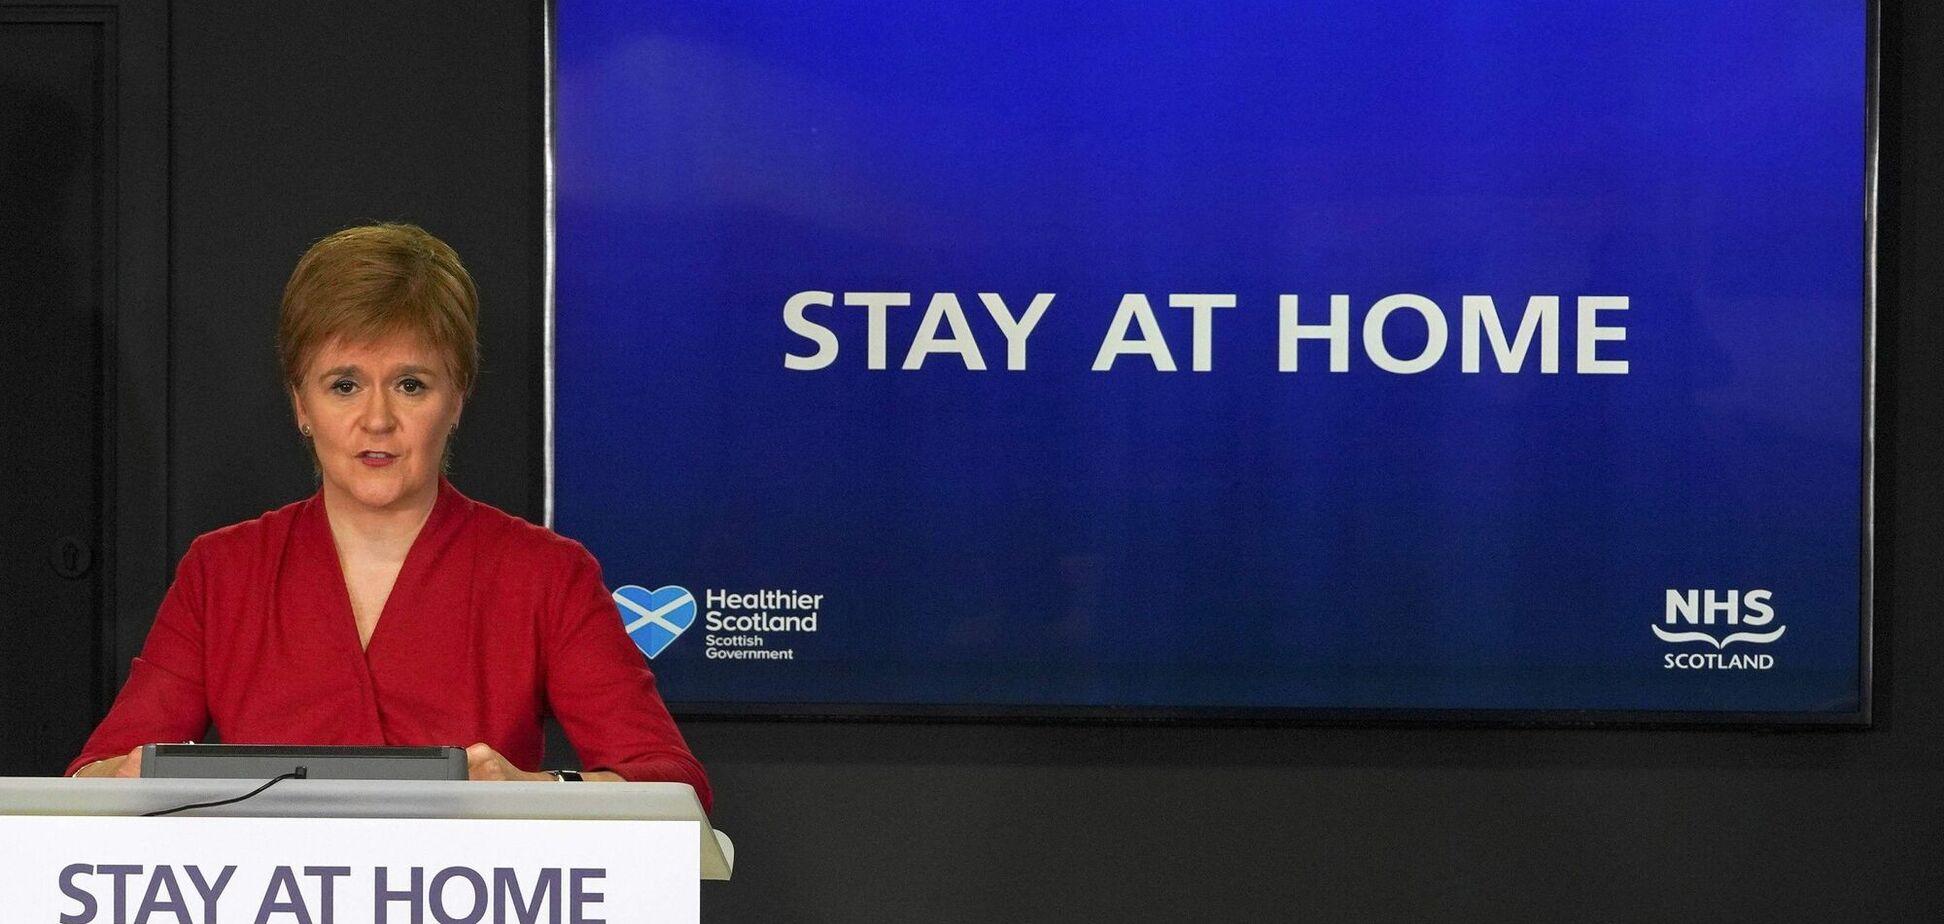 Никола Стерджен объявила о локдауне в Шотландии